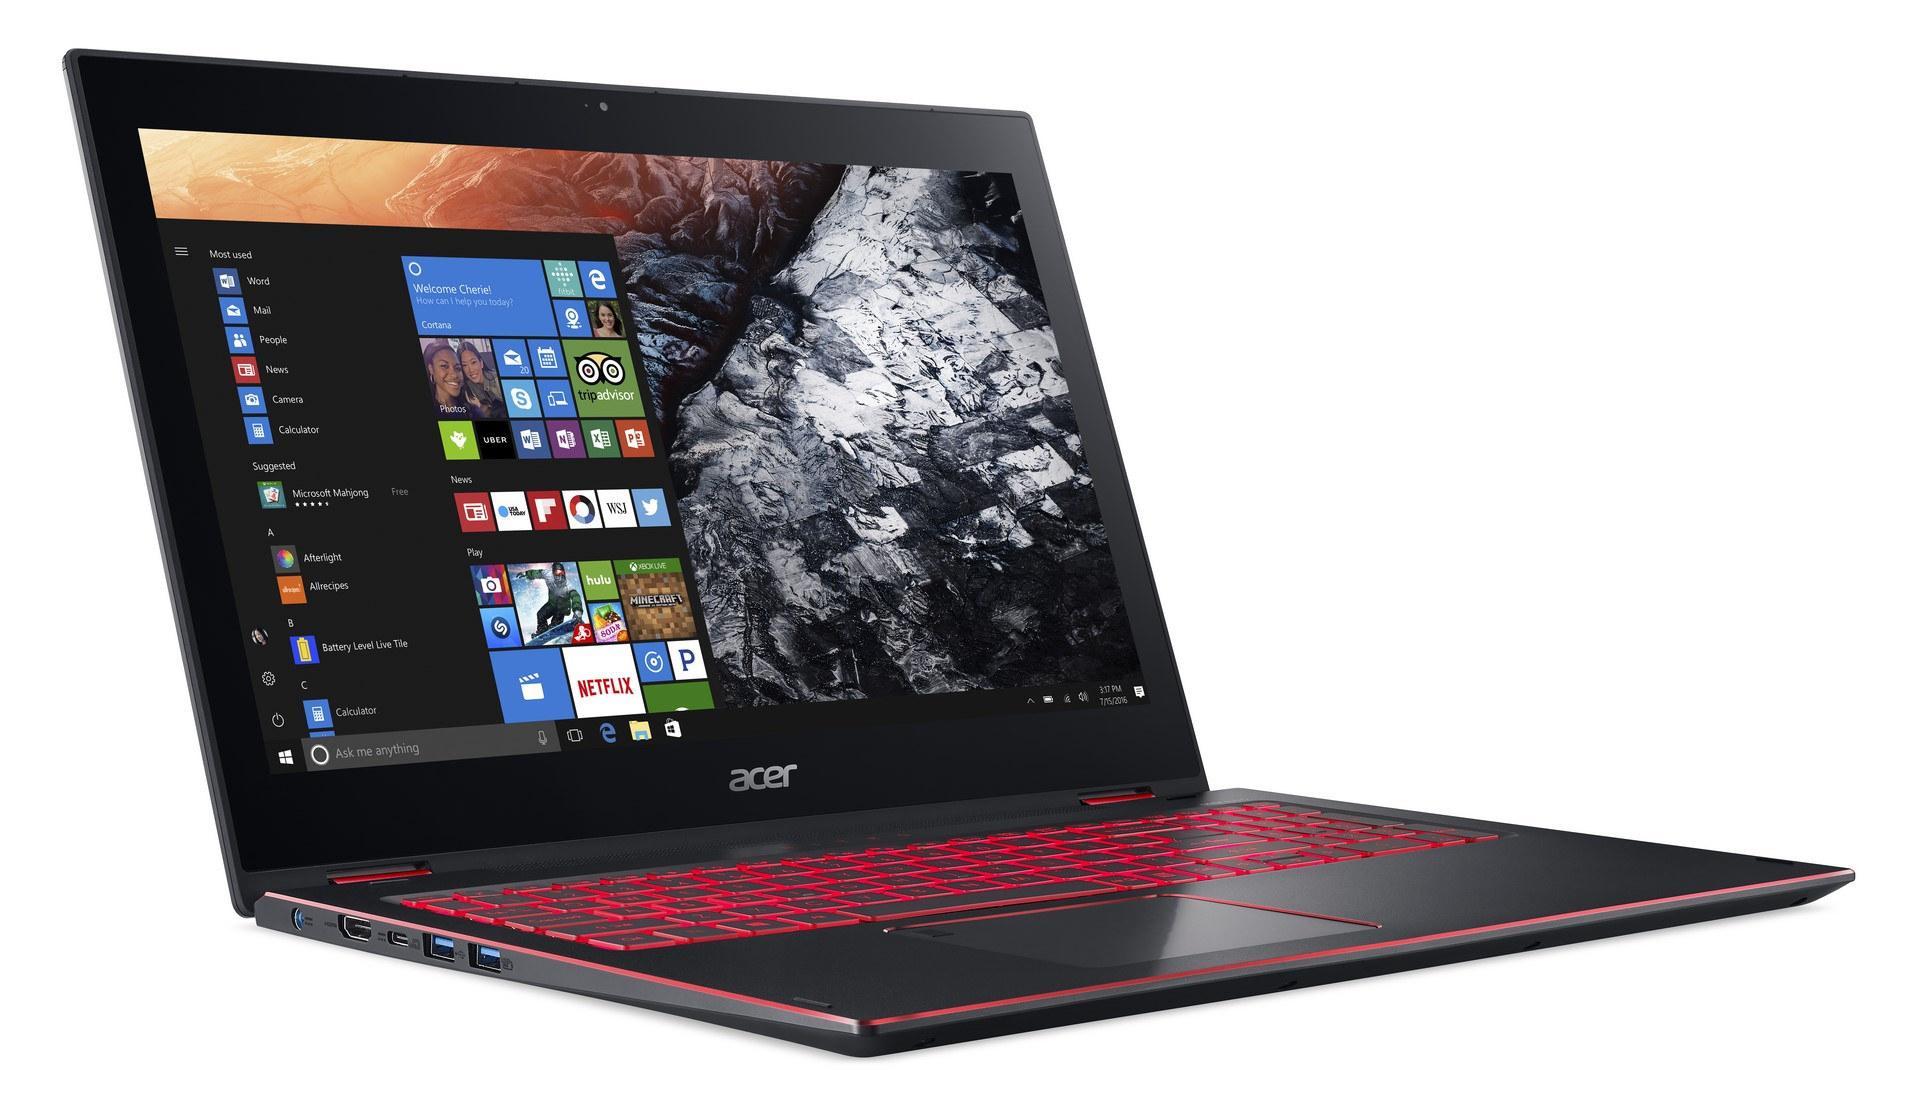 Gaming desktop Intel I7 quad core 8gb ram 1tb HDD with 18.5 22 24 inch monitor superior quality